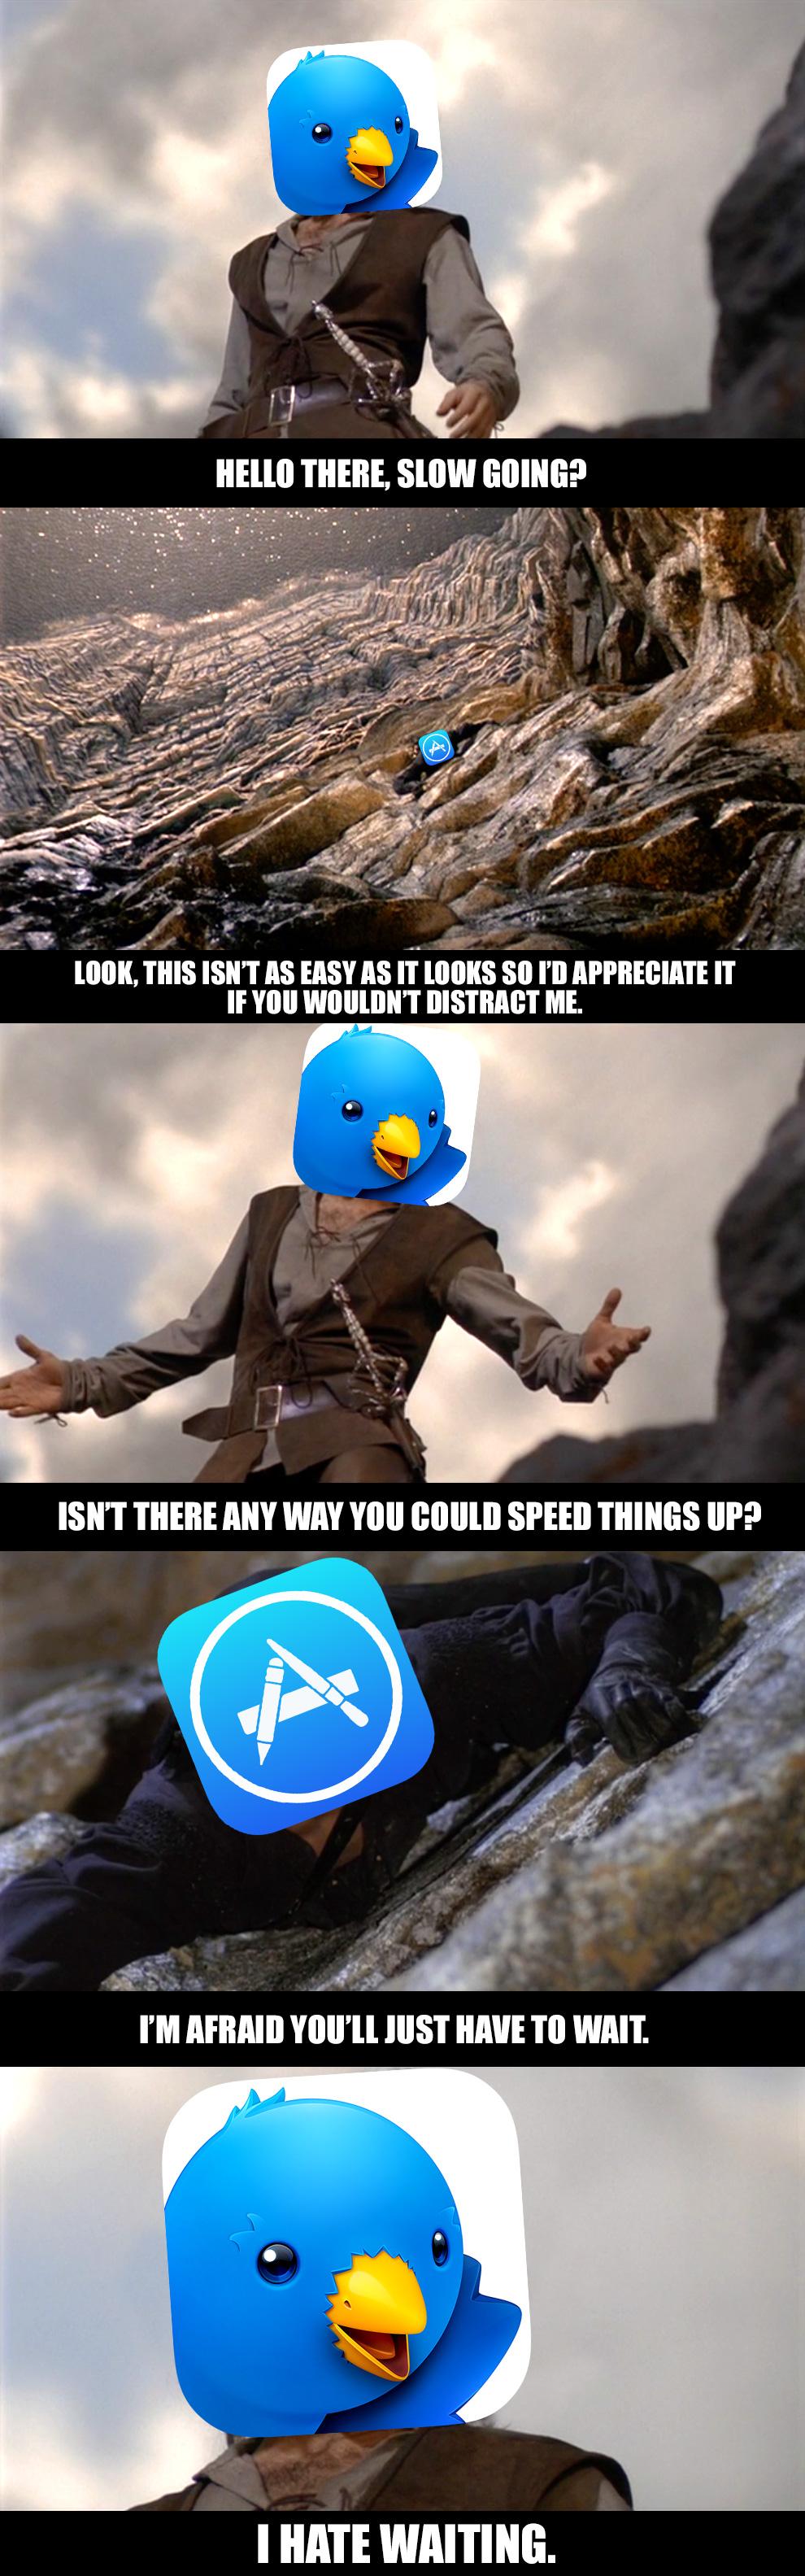 ThePrincessApp